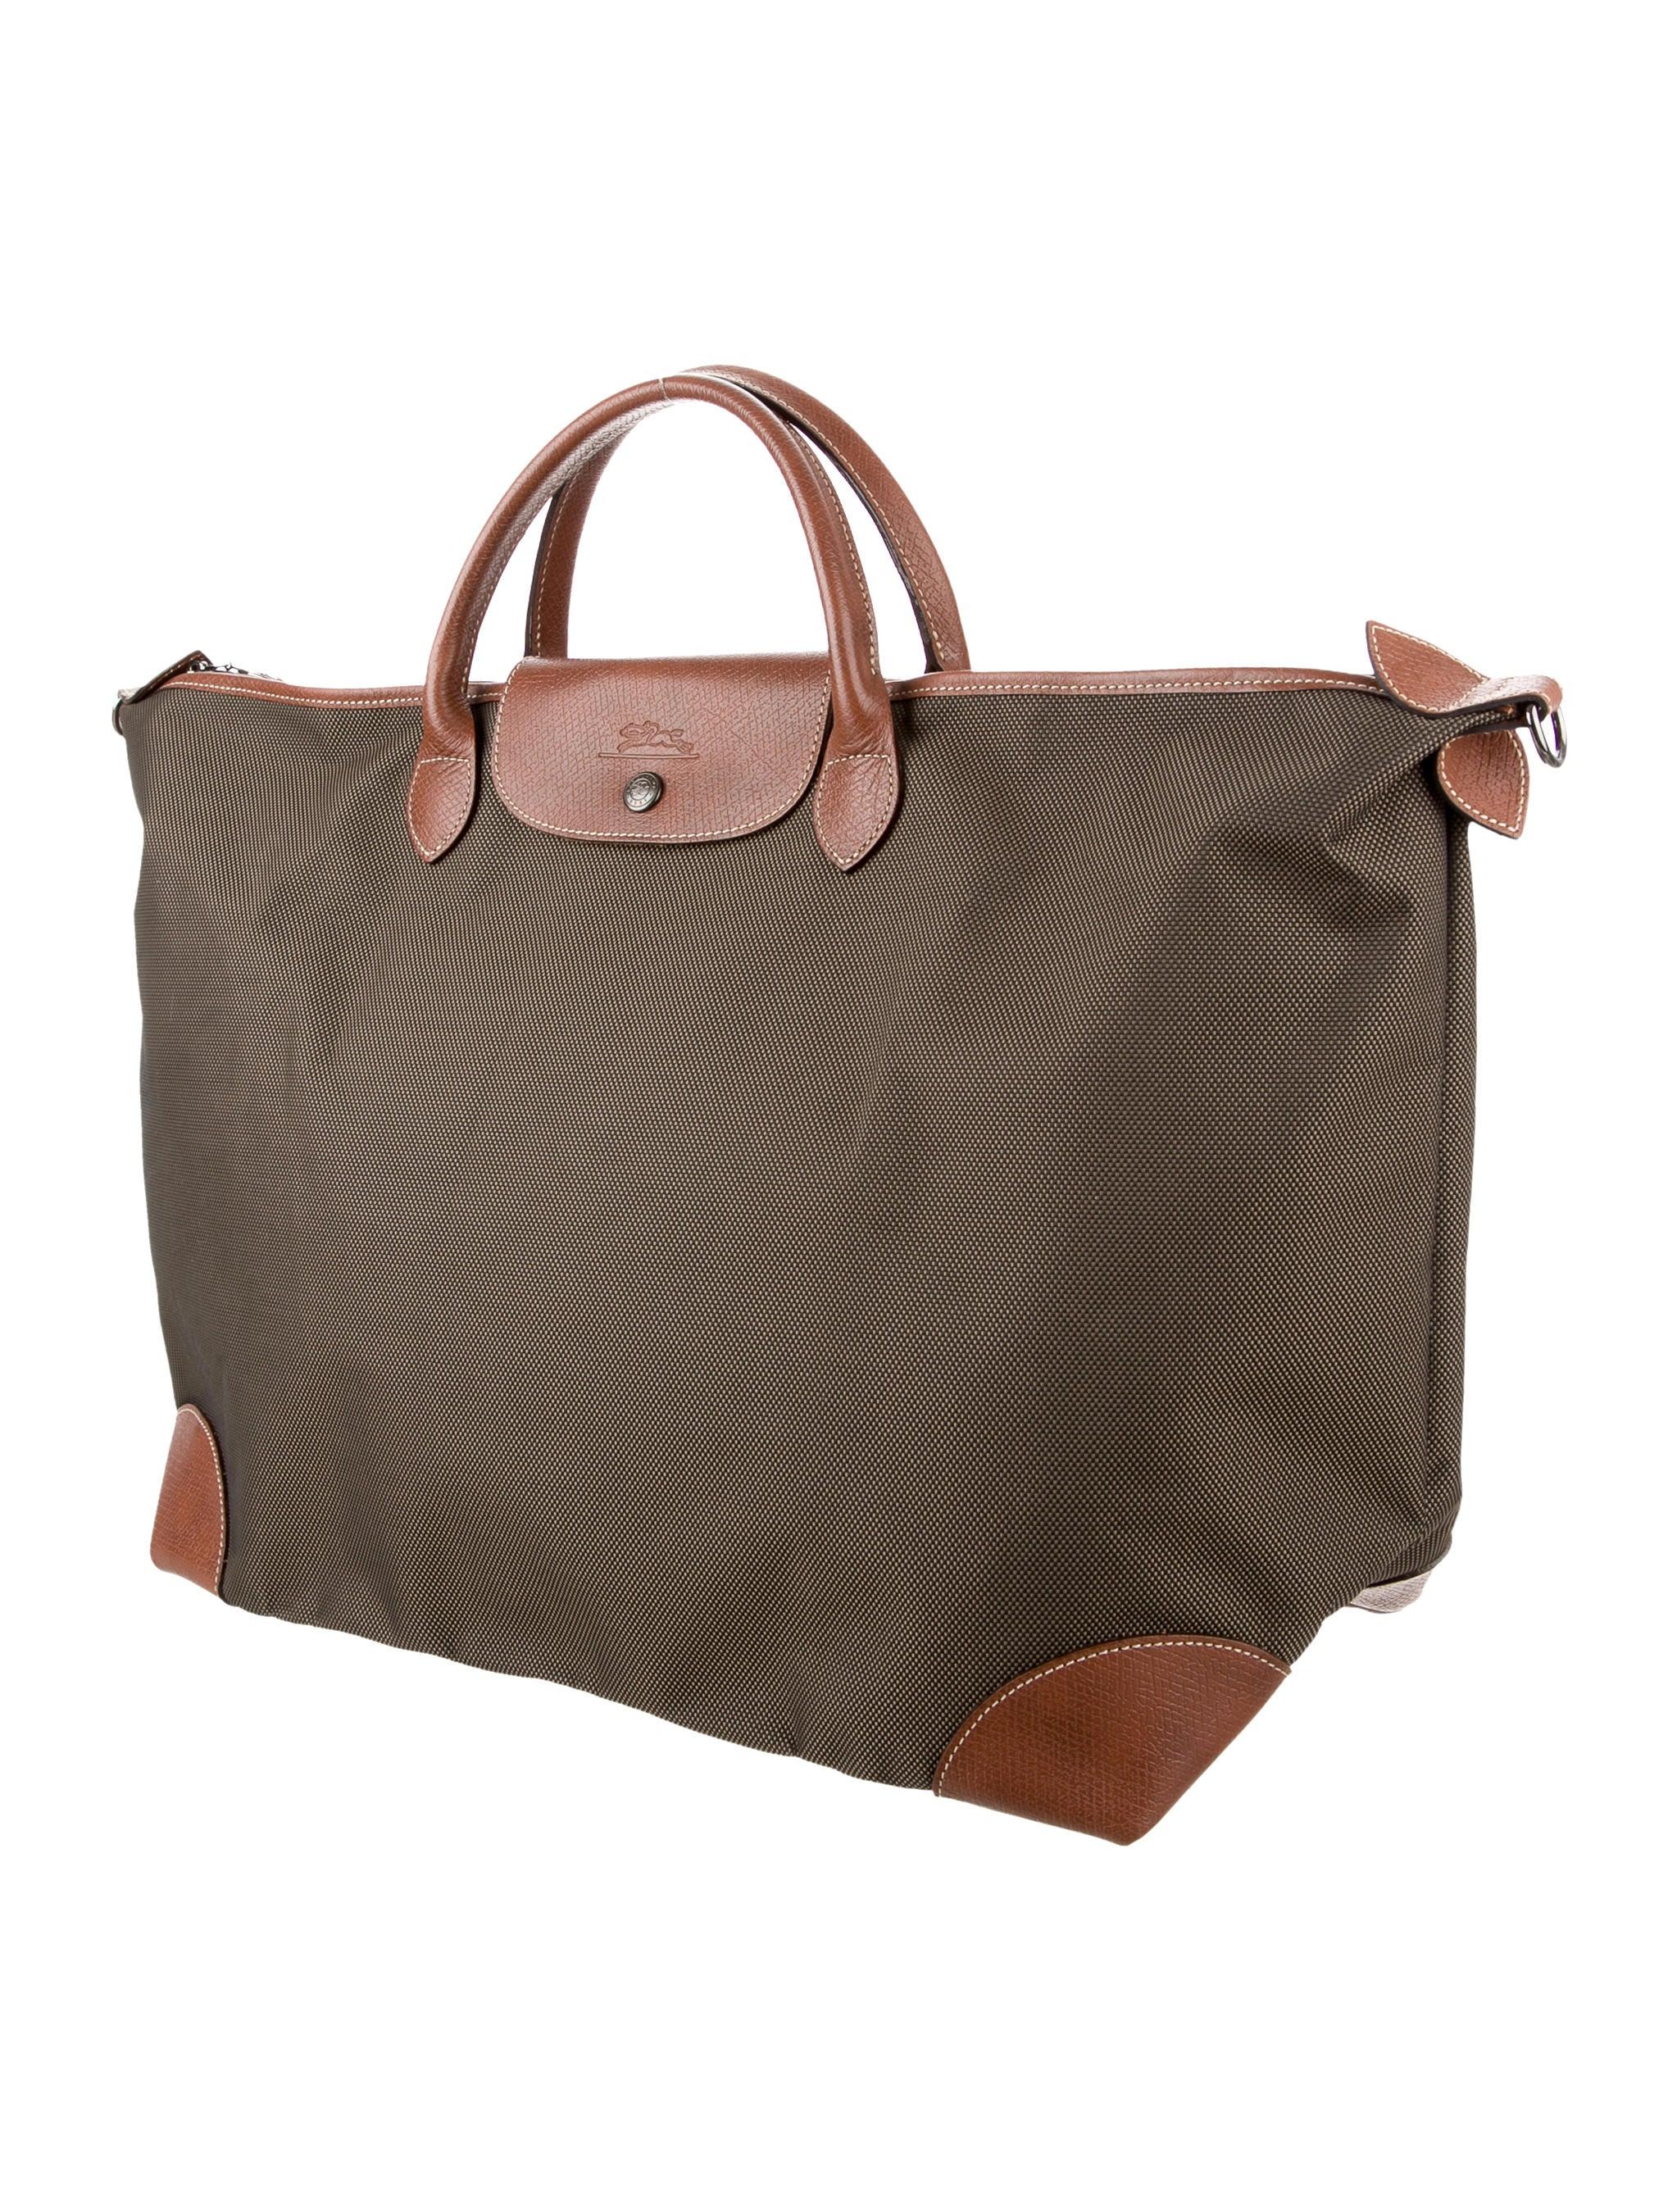 Longchamp Boxford Travel Bag France  5d0fa89ee6536